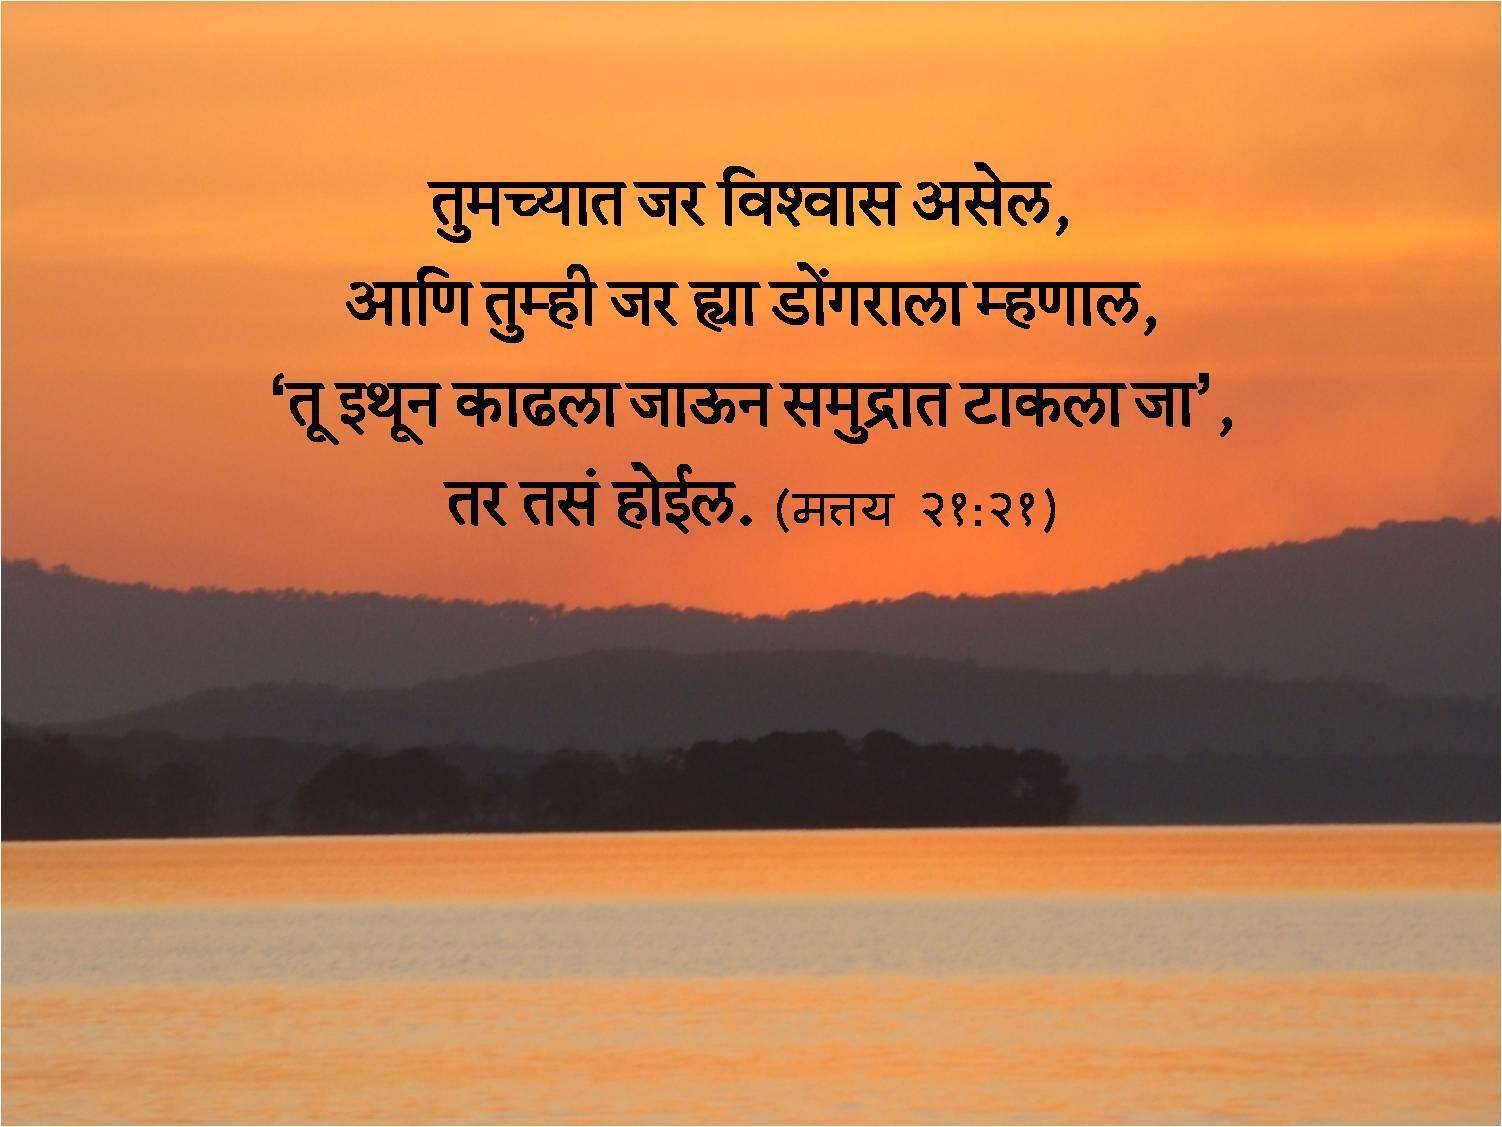 marathi bible wallpaper for - photo #26